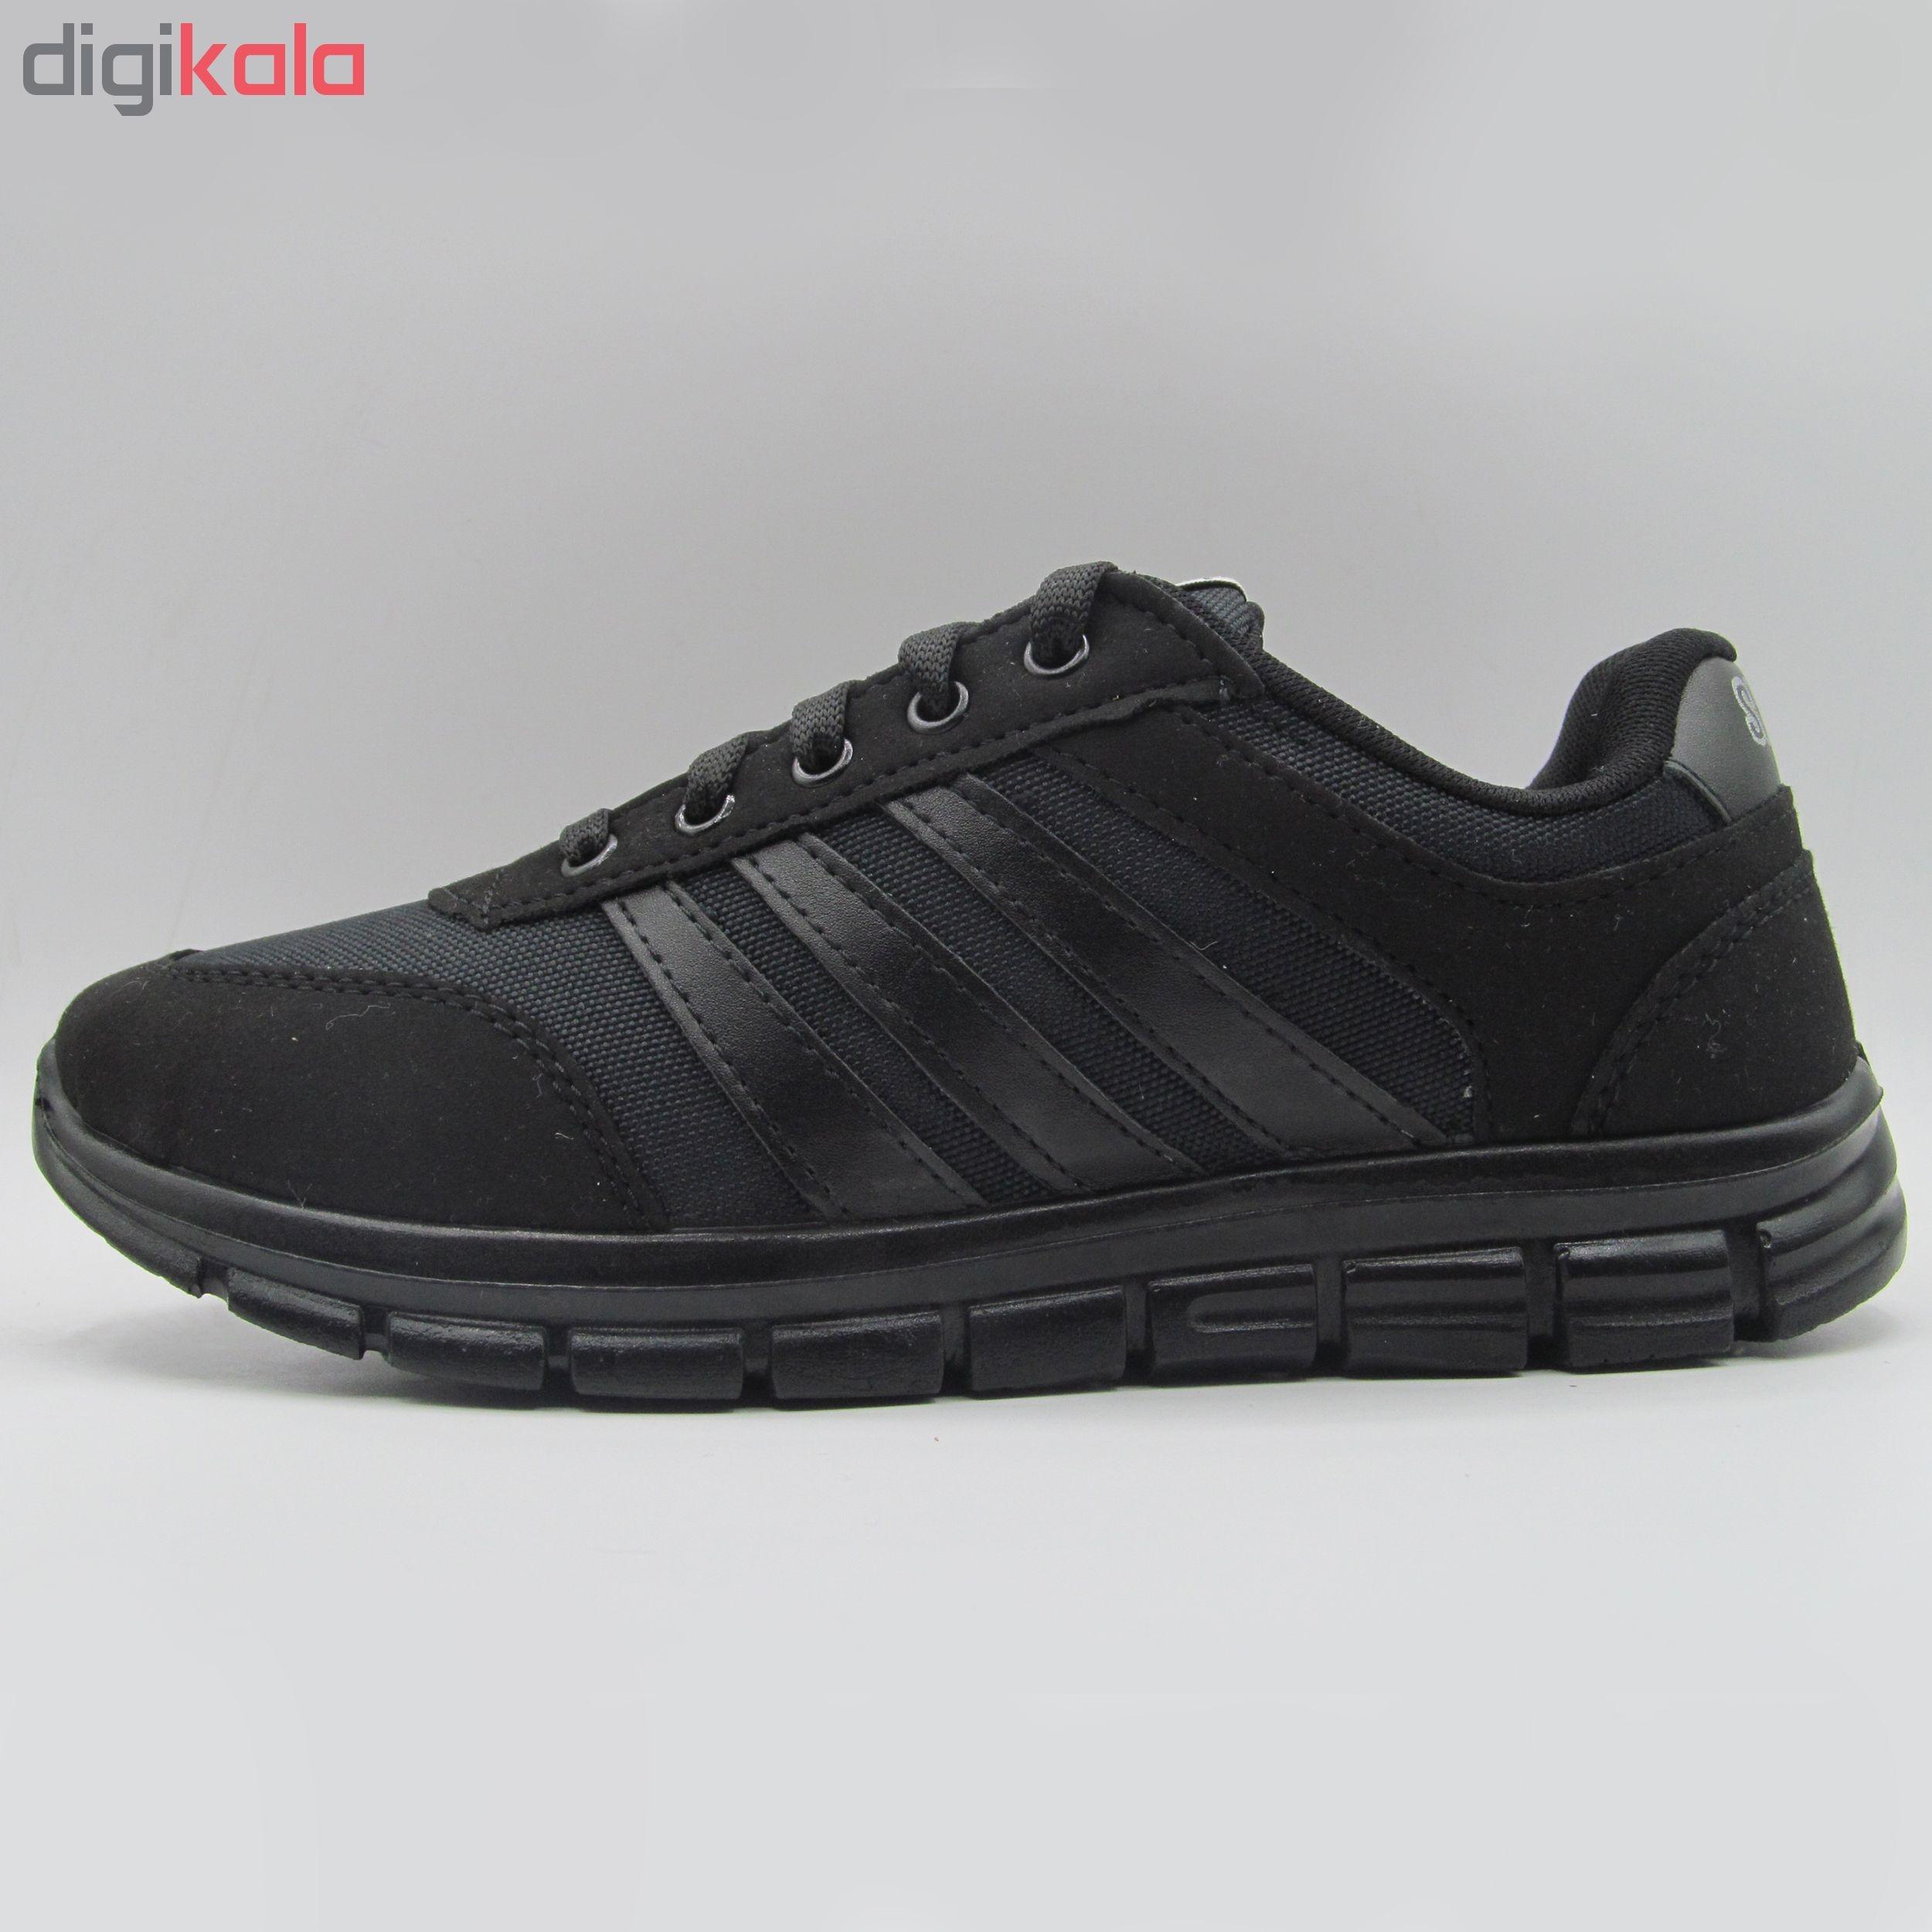 کفش نه شیما مدل فایبورگ کد 18